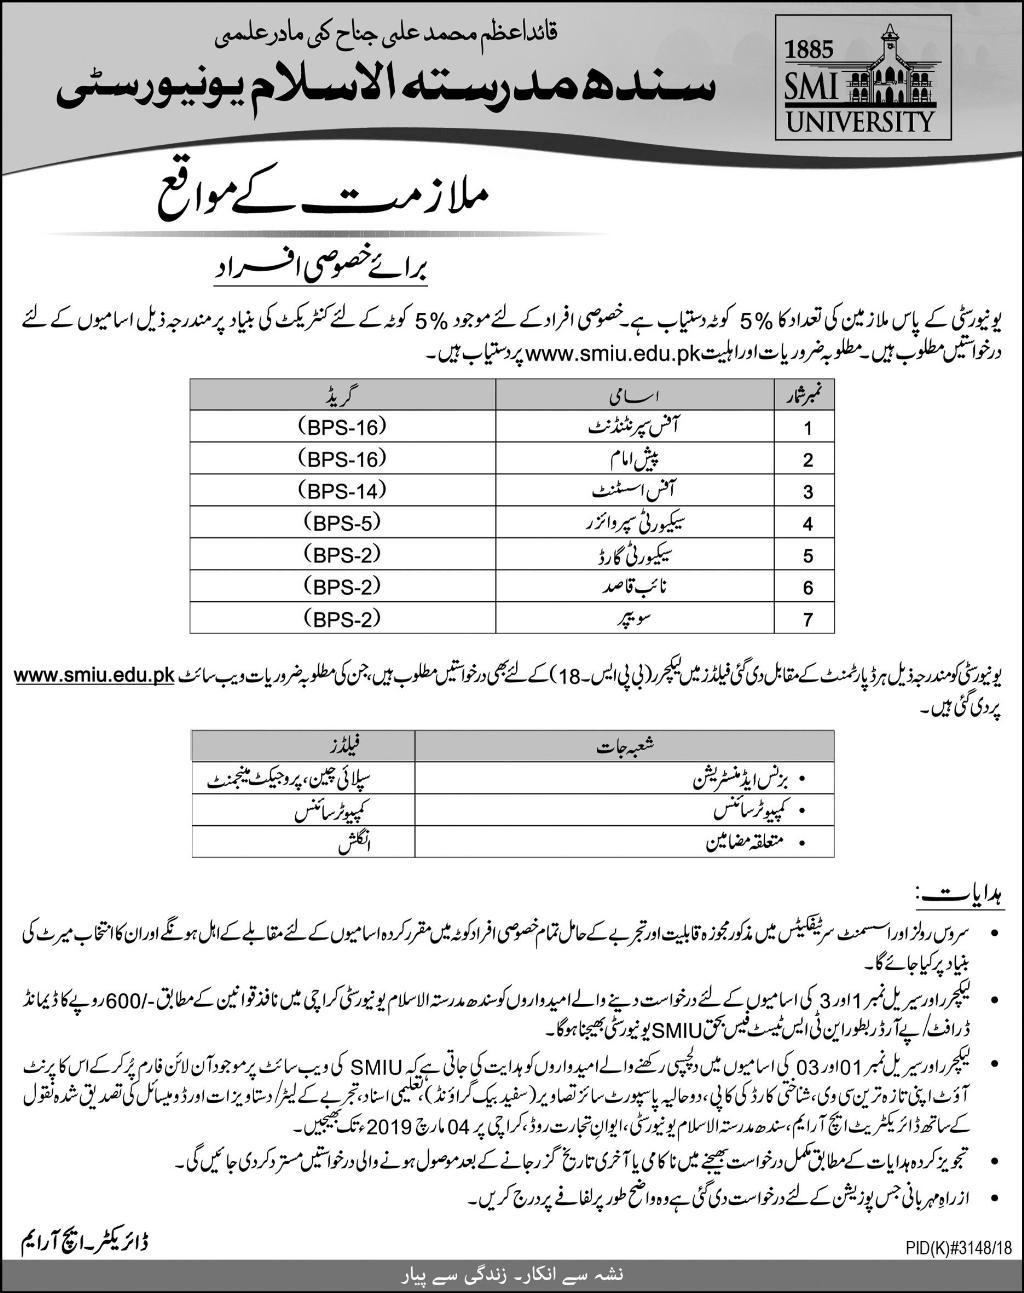 Advertisement for the SMI University Jobs